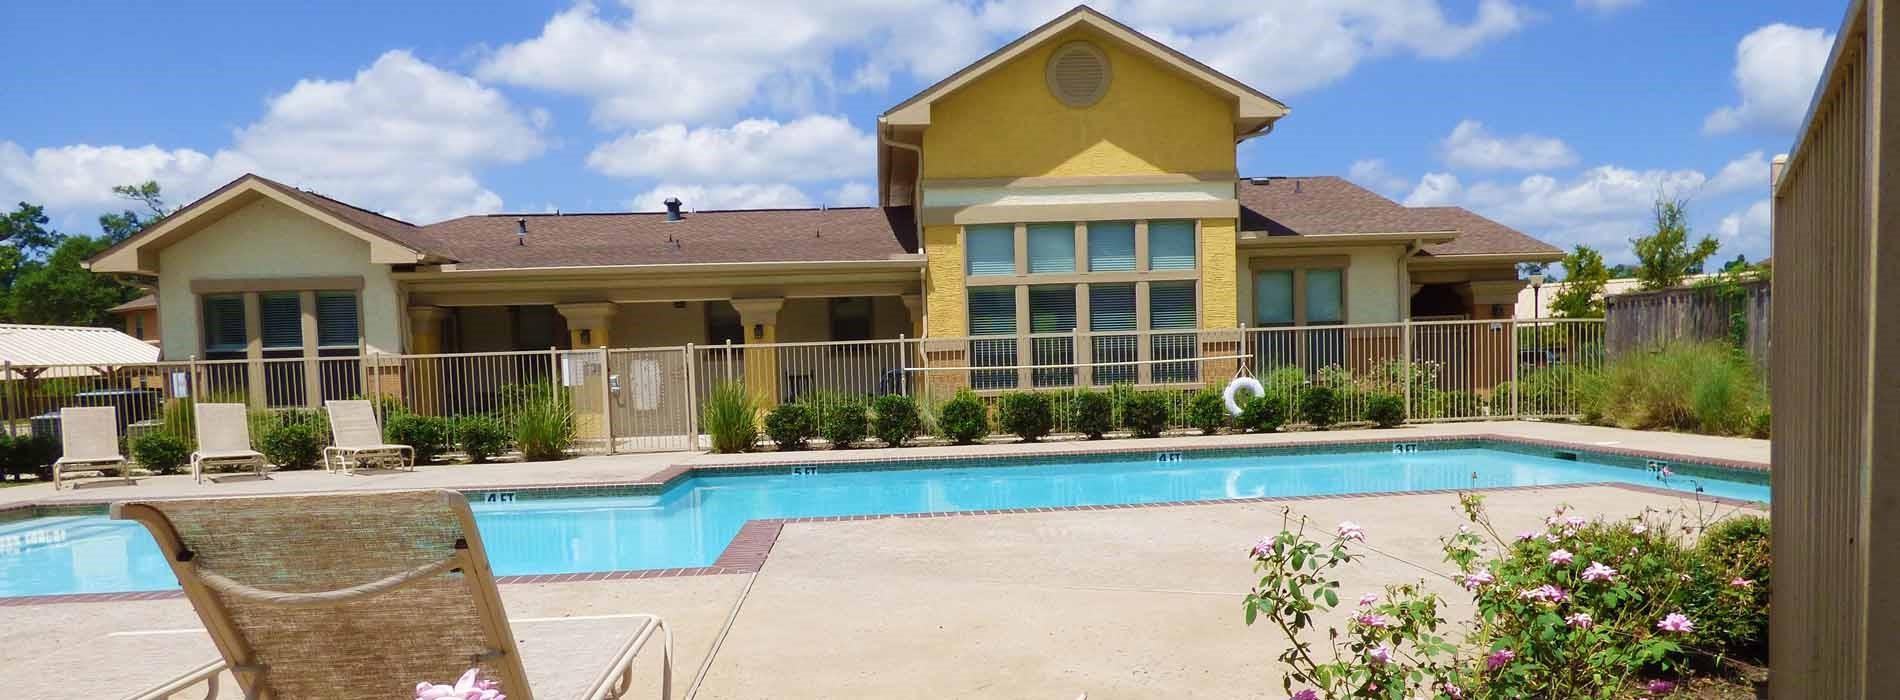 Auburn Square Apartment Homes | Vidor, TX | (409) 769-9331